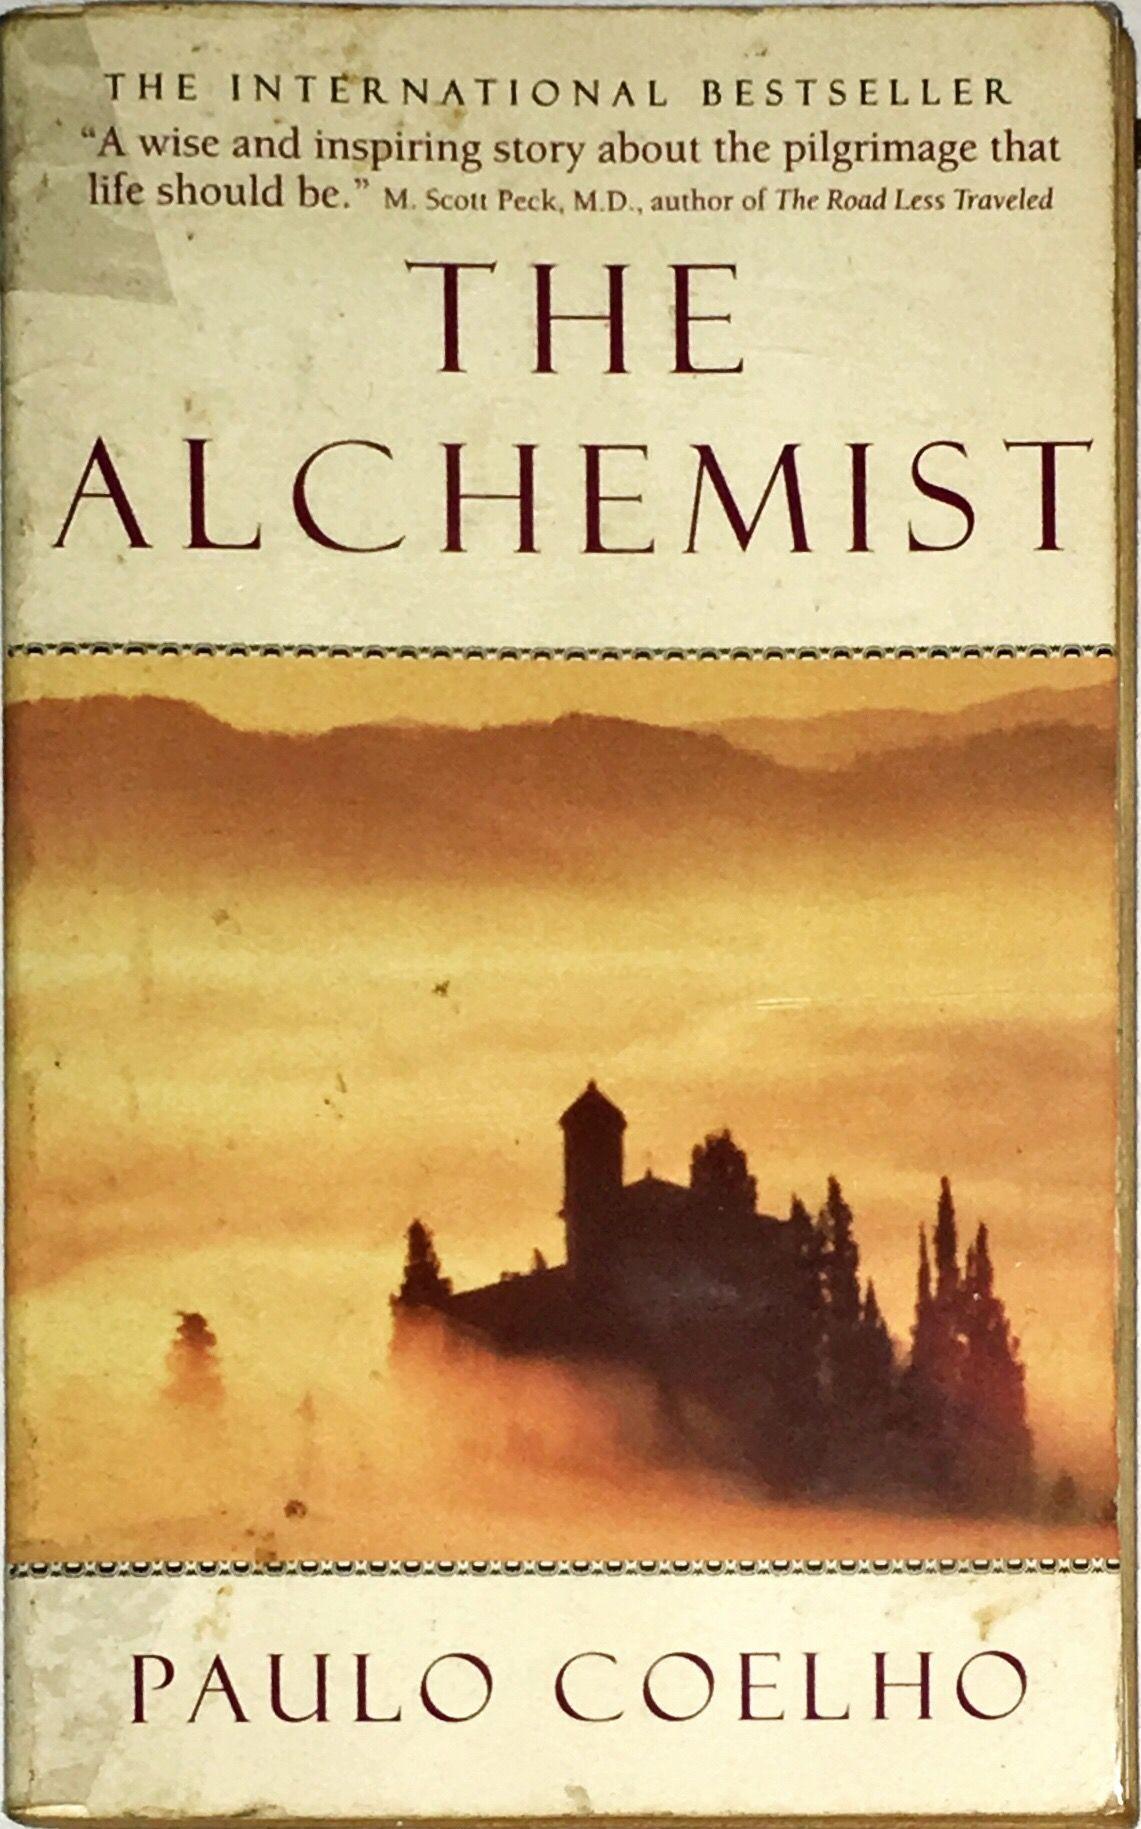 Pin by Joan Romero on Aklat The alchemist paulo coelho